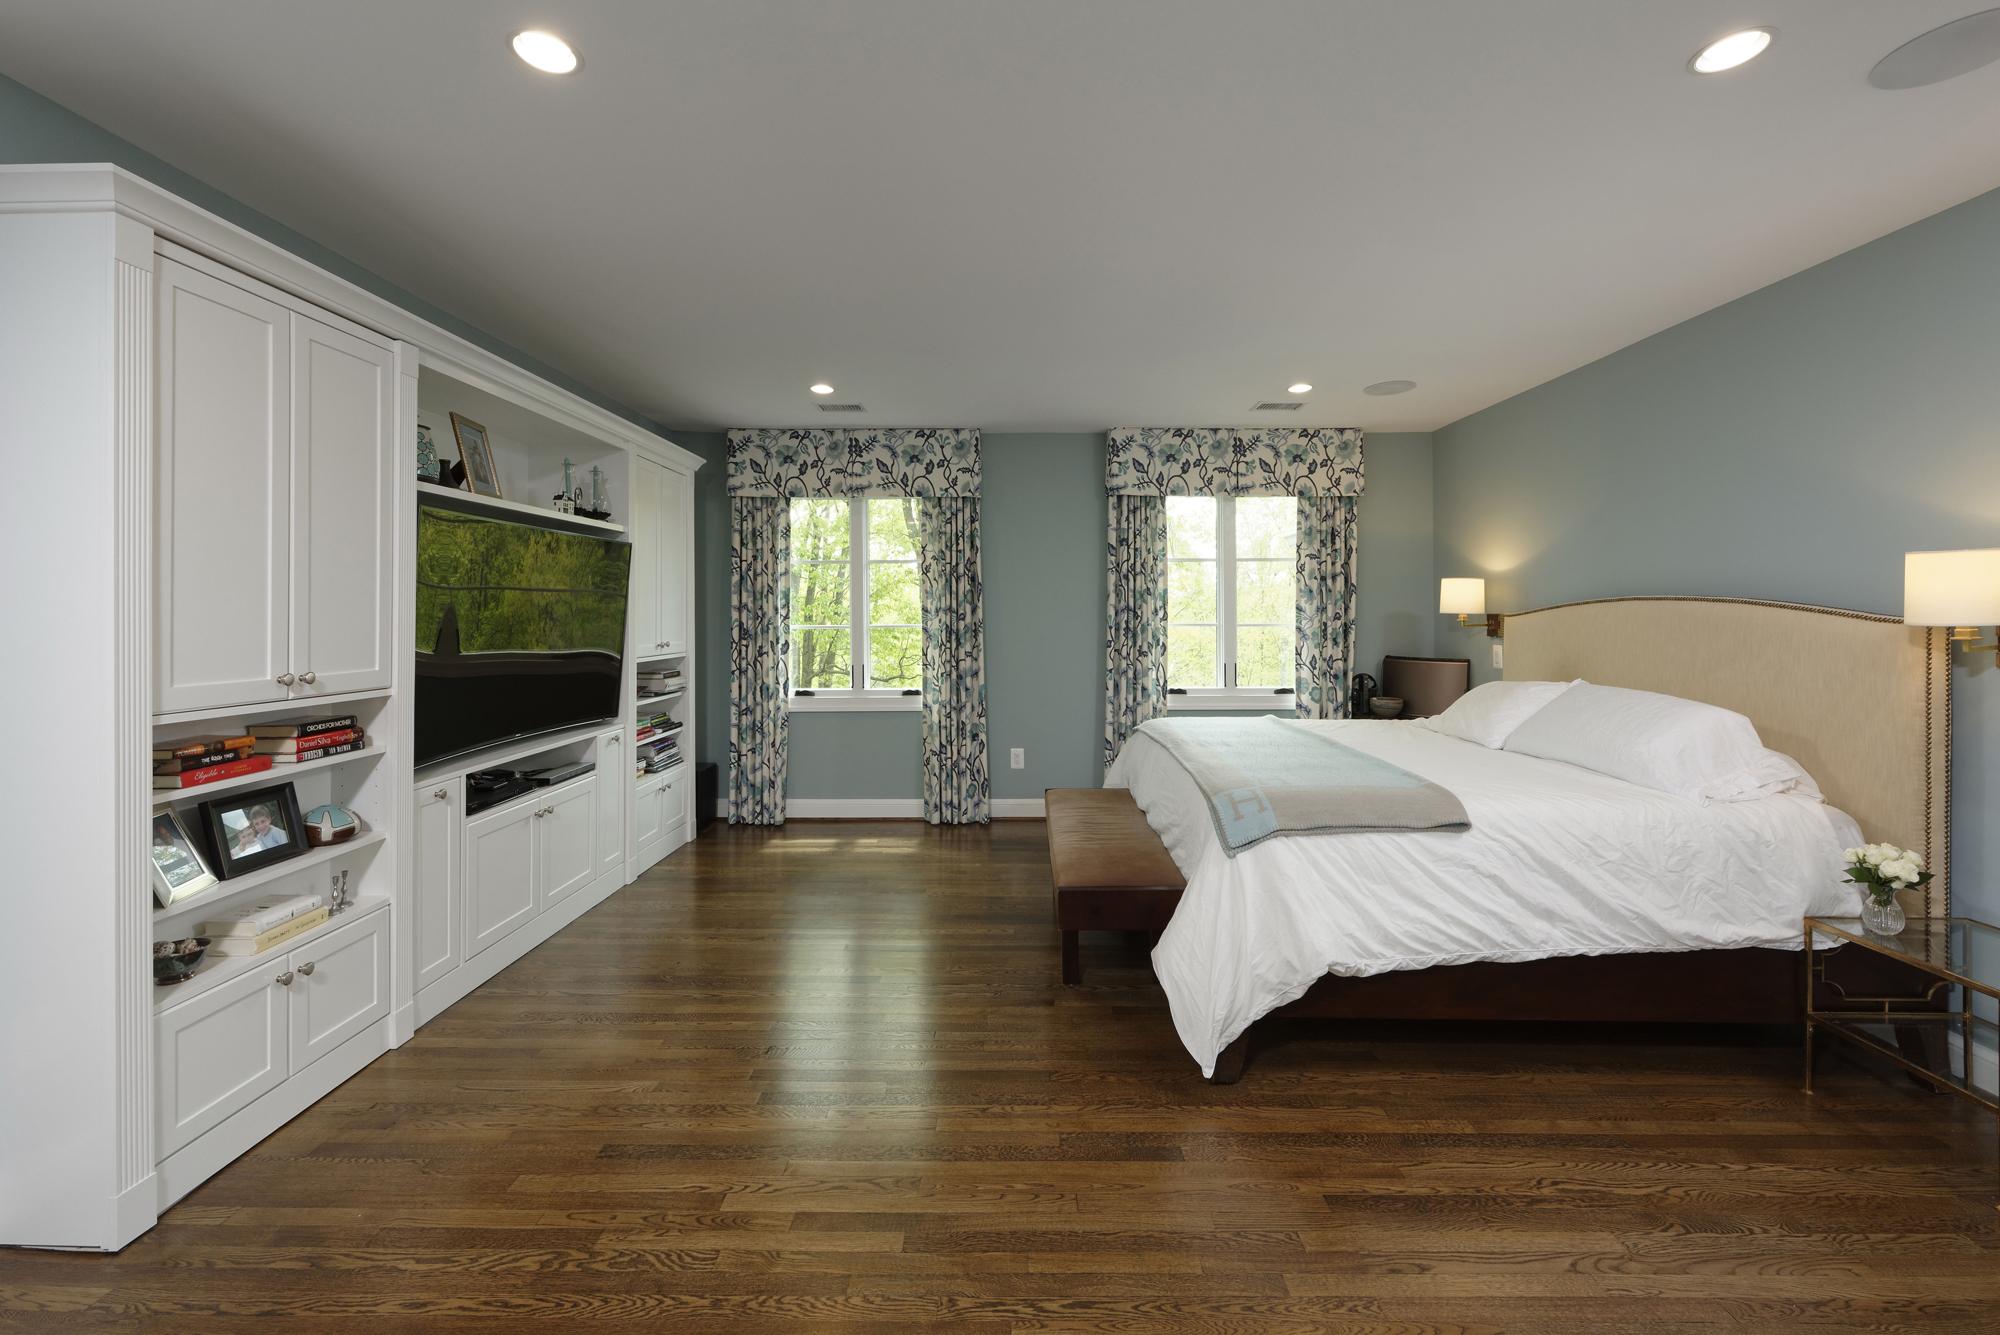 McLean, Virginia Master Bedroom Renovation With Builtins